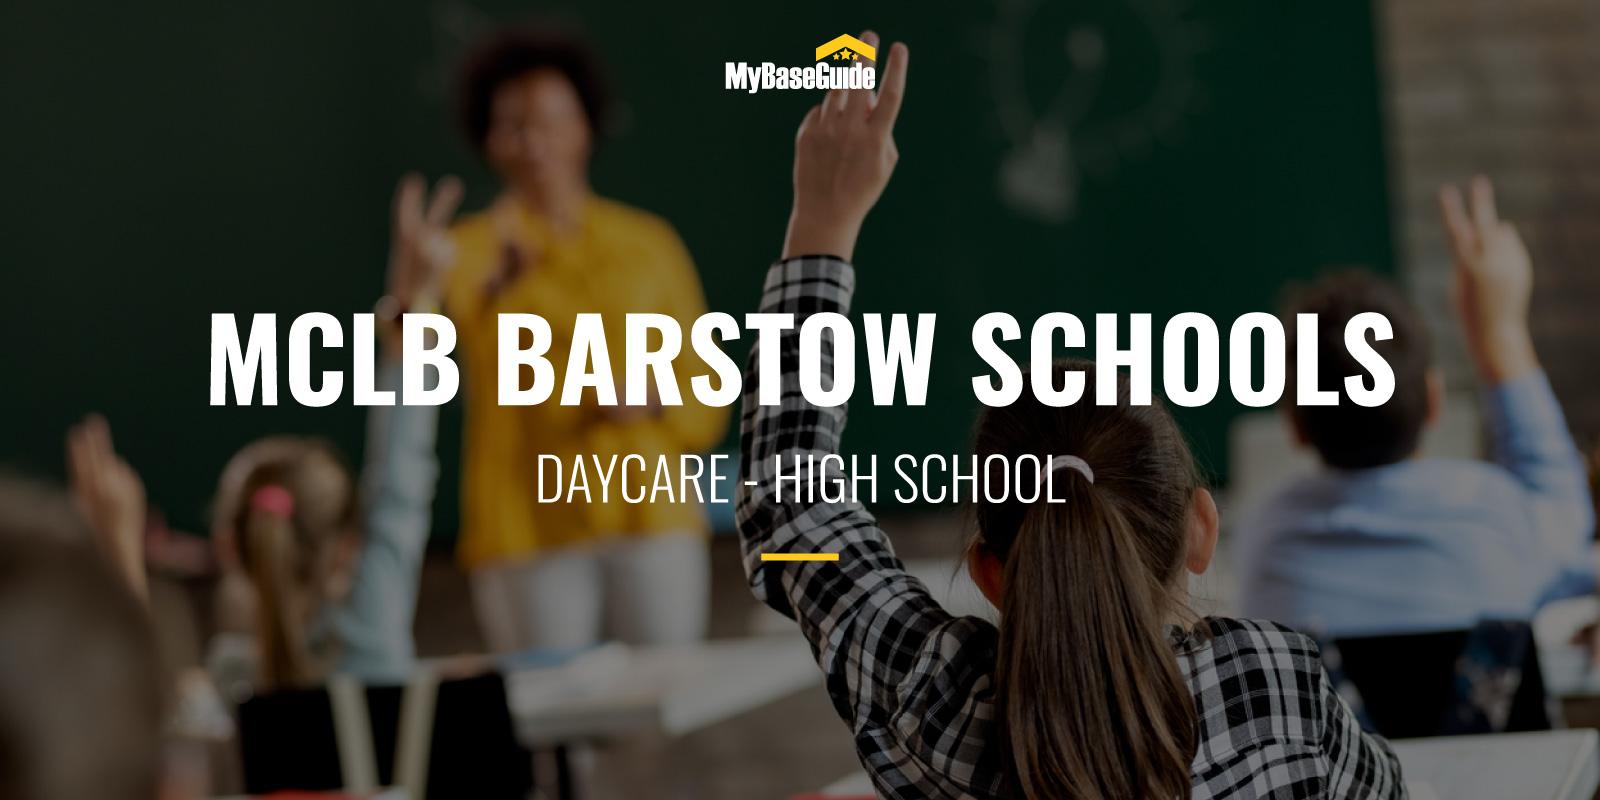 MCLB Barstow Schools: Daycare - High School